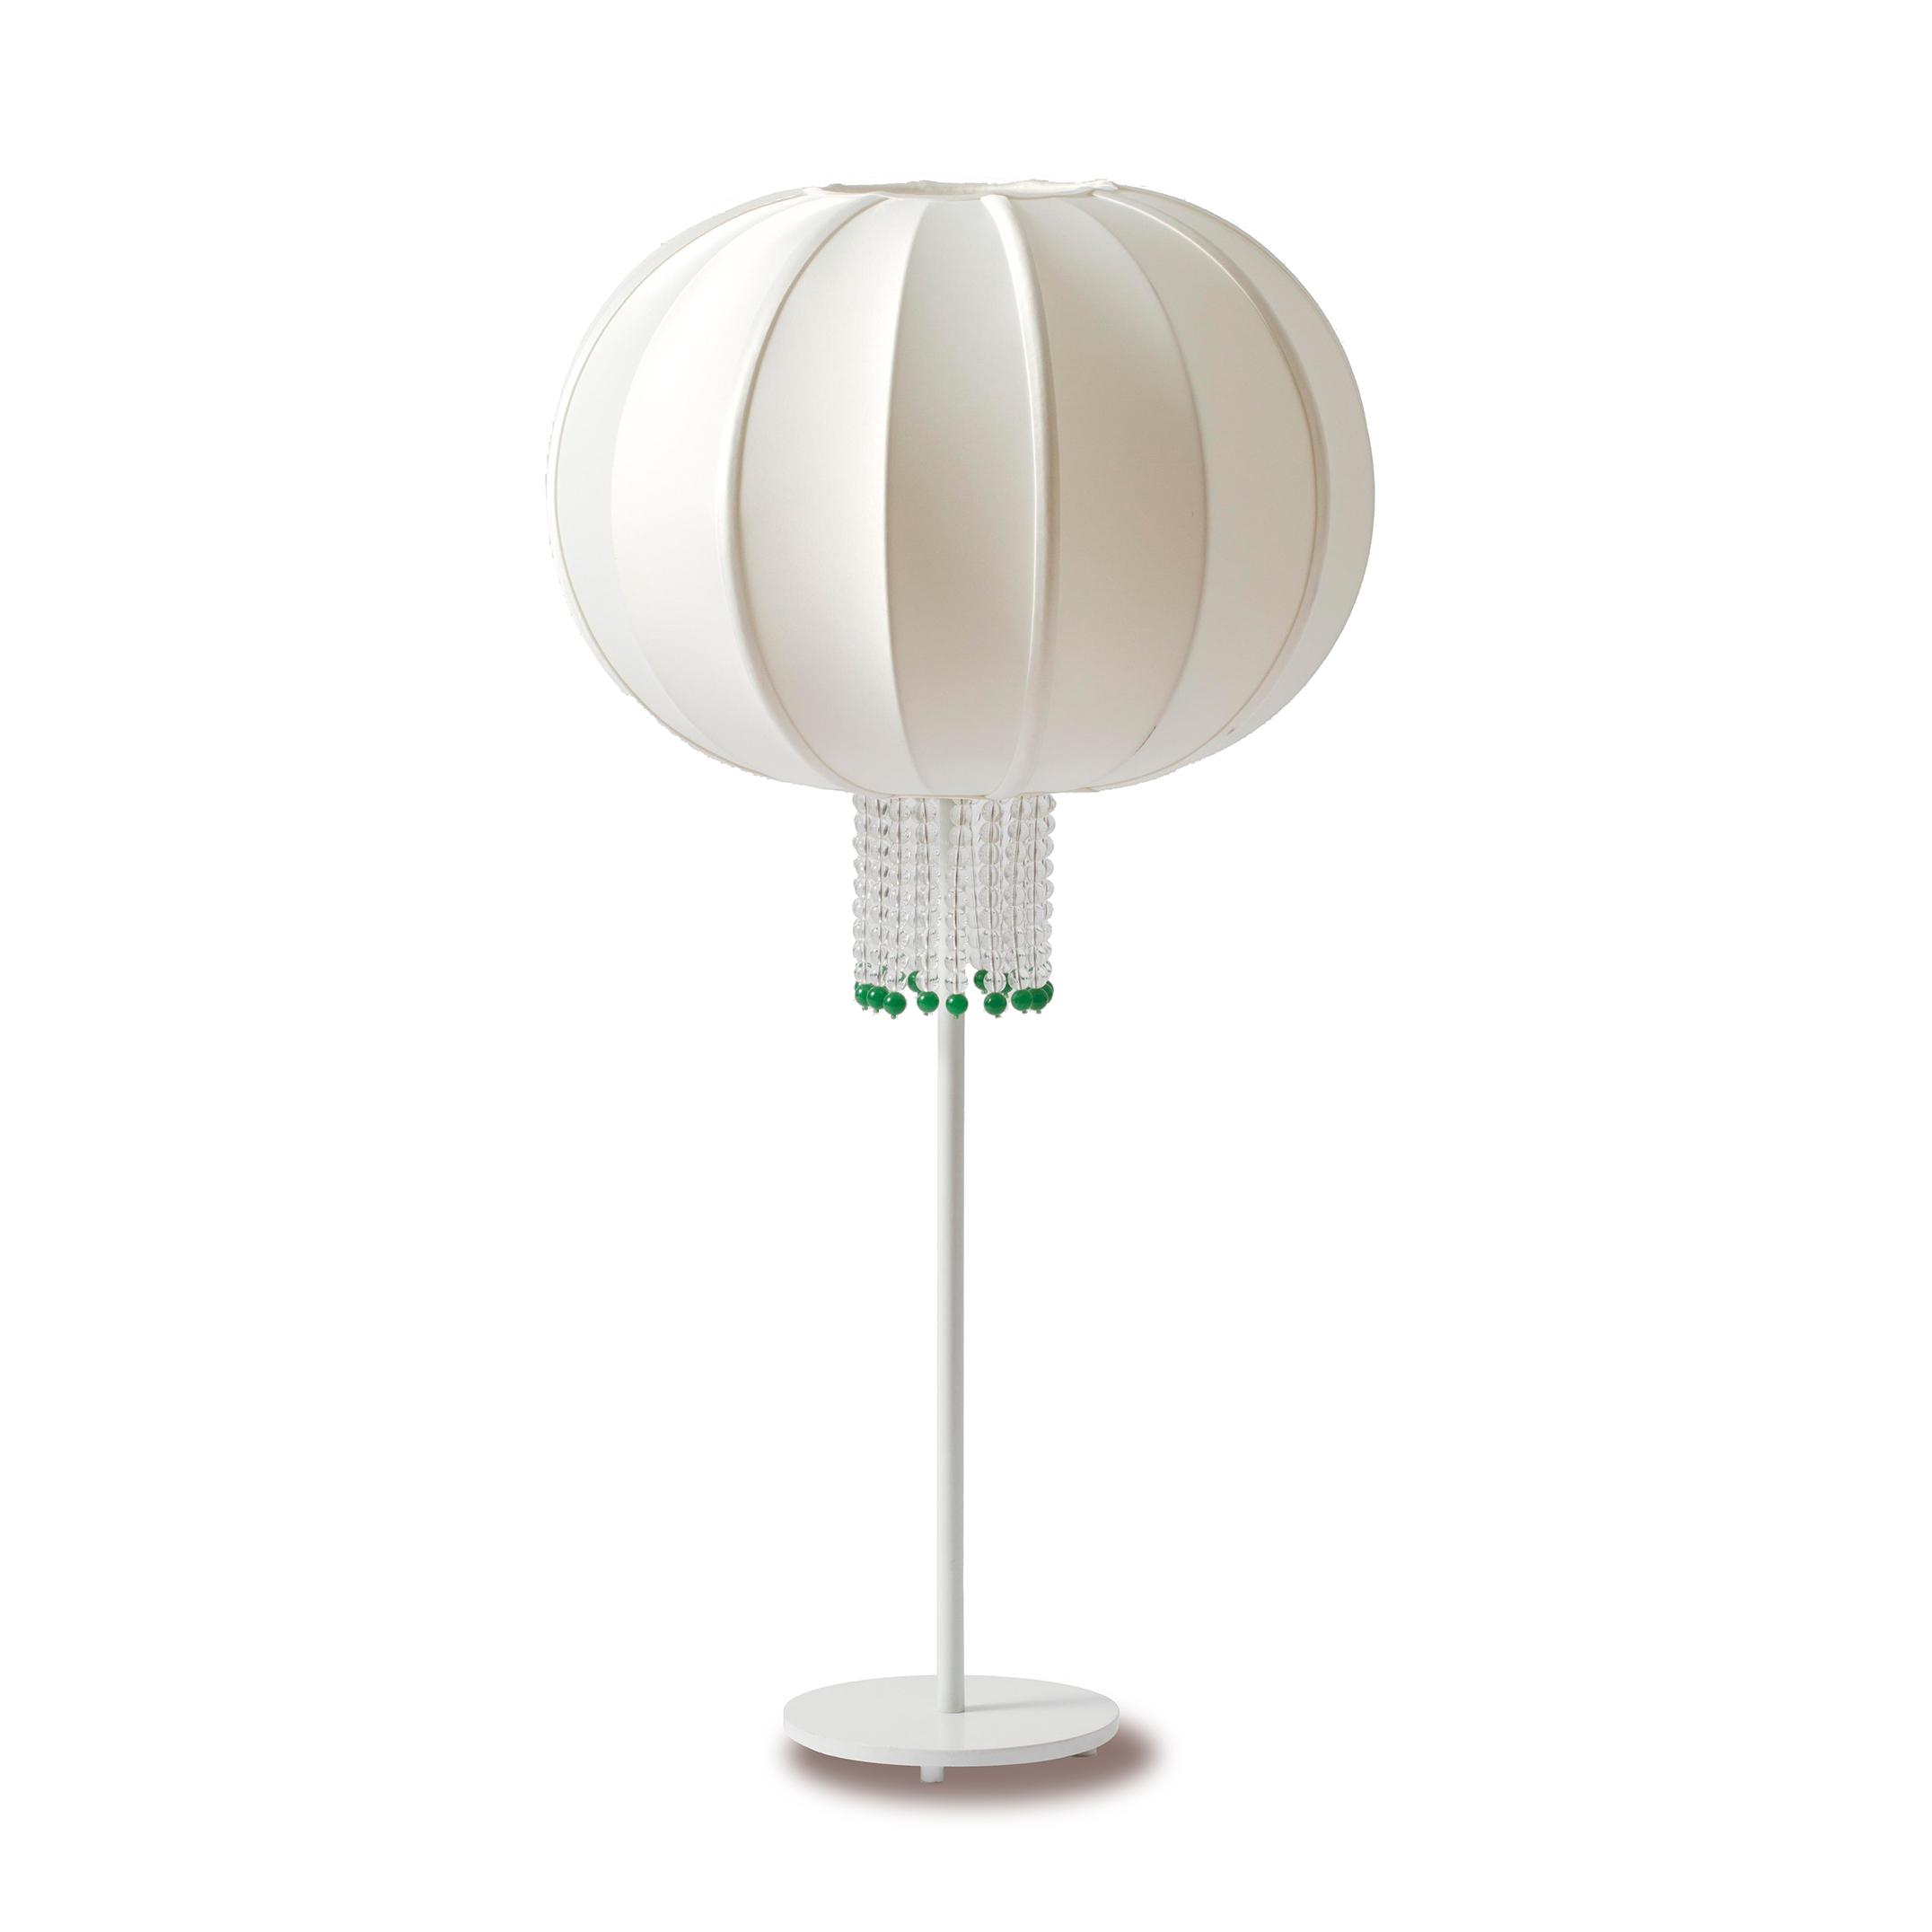 chinese lantern lamp photo - 6